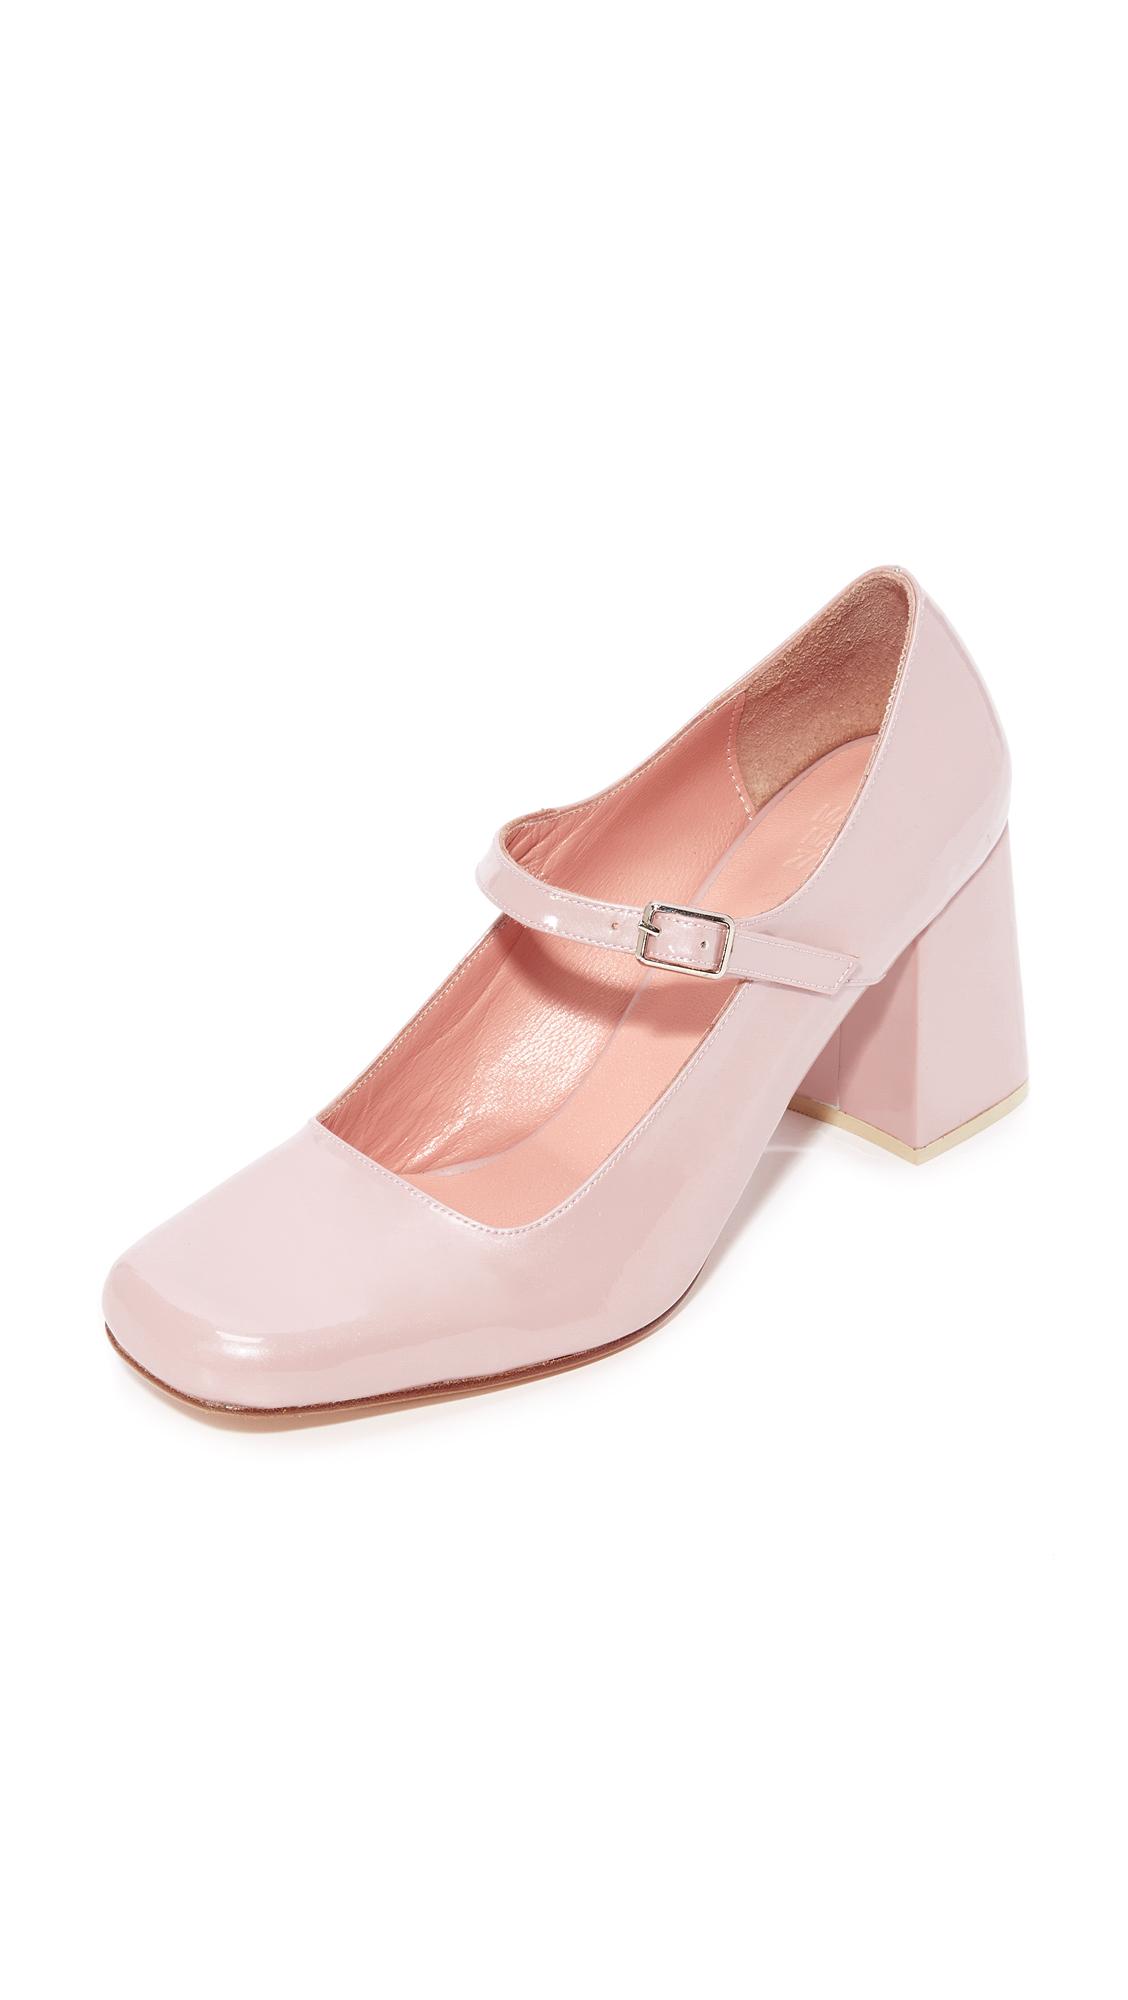 Maryam Nassir Zadeh Mary Jane Pumps - Pink